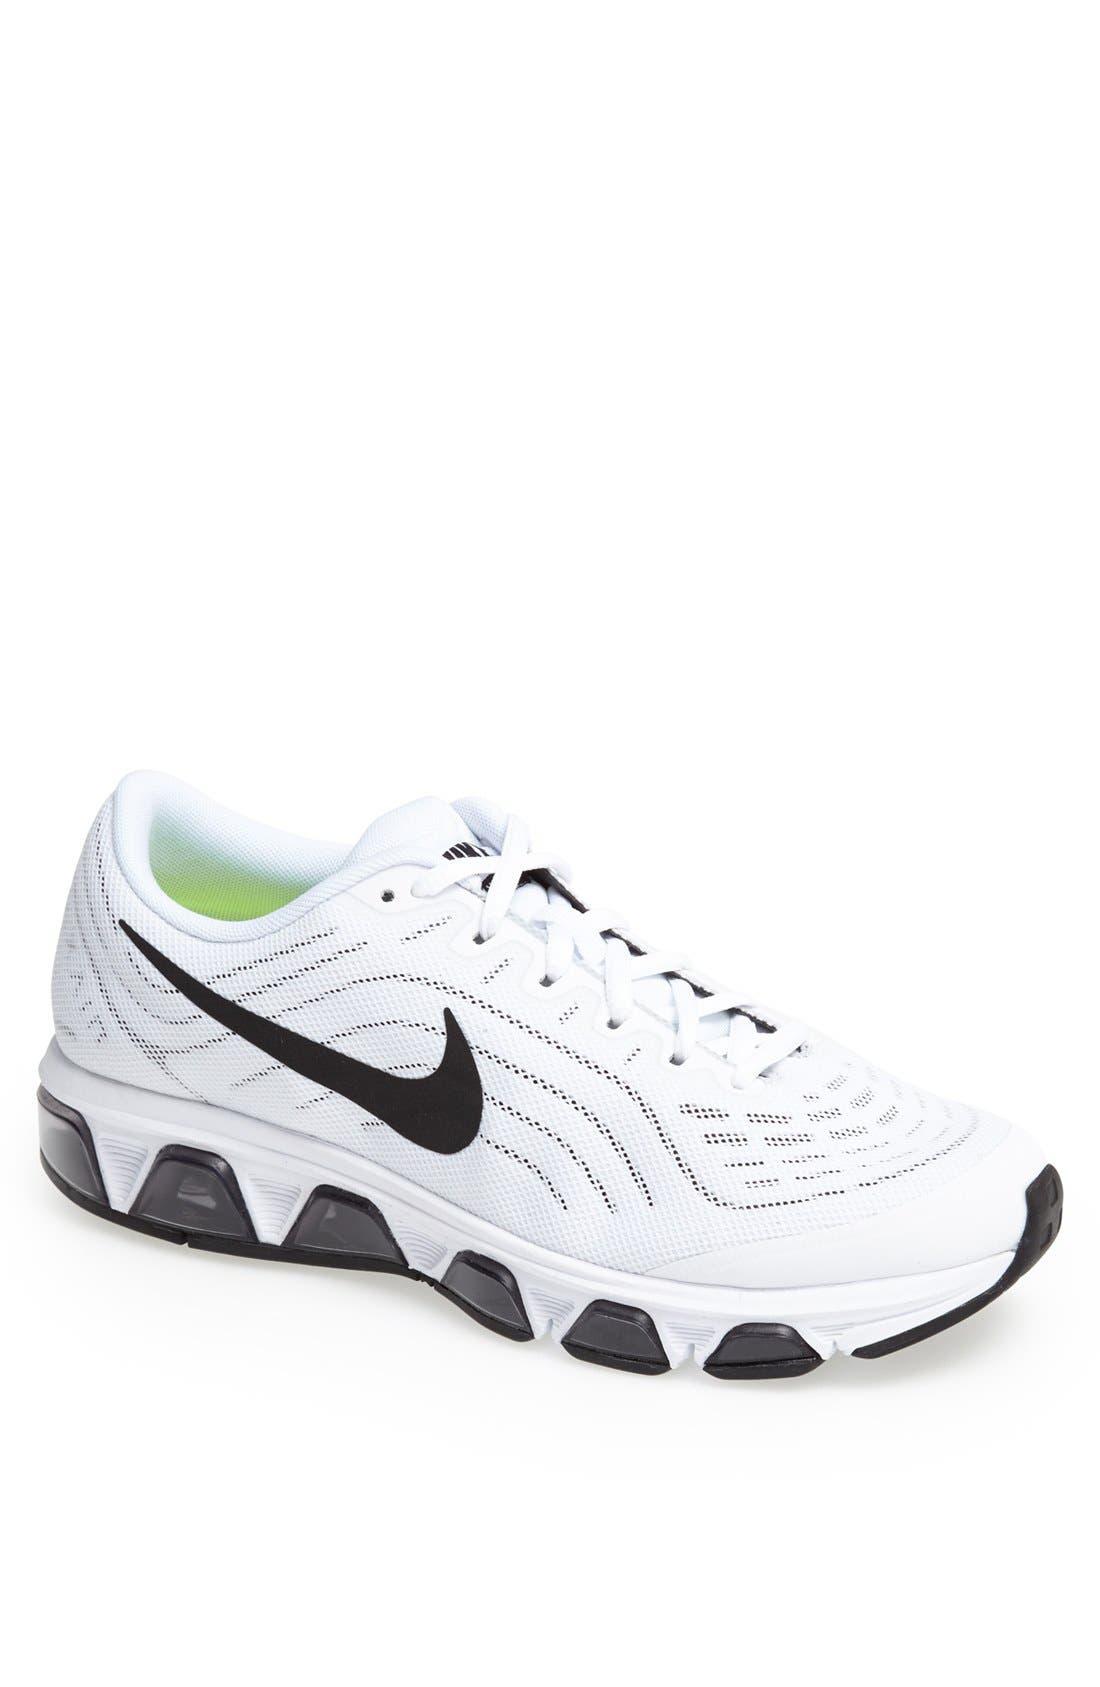 Alternate Image 1 Selected - Nike 'Air Max Tailwind 6' Running Shoe (Men)